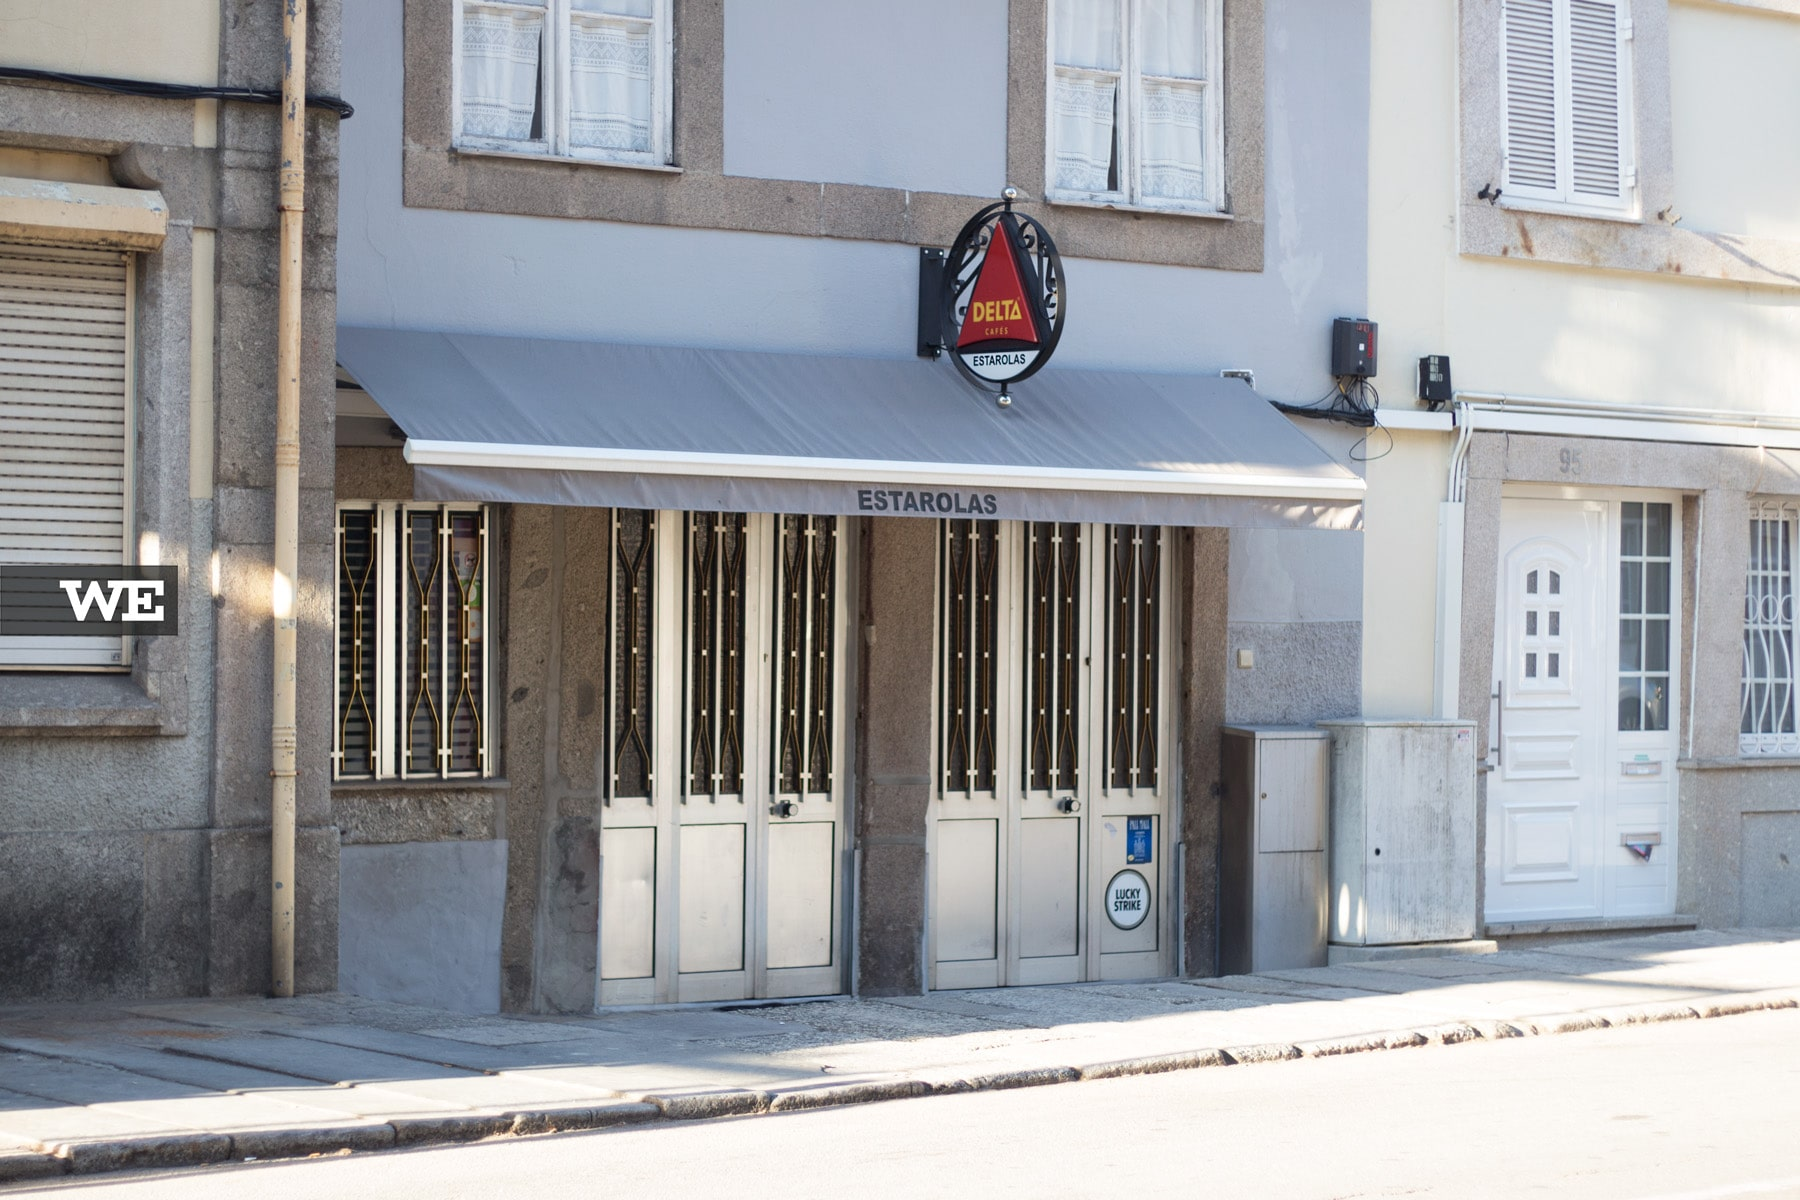 Estarolas Tascos em Braga